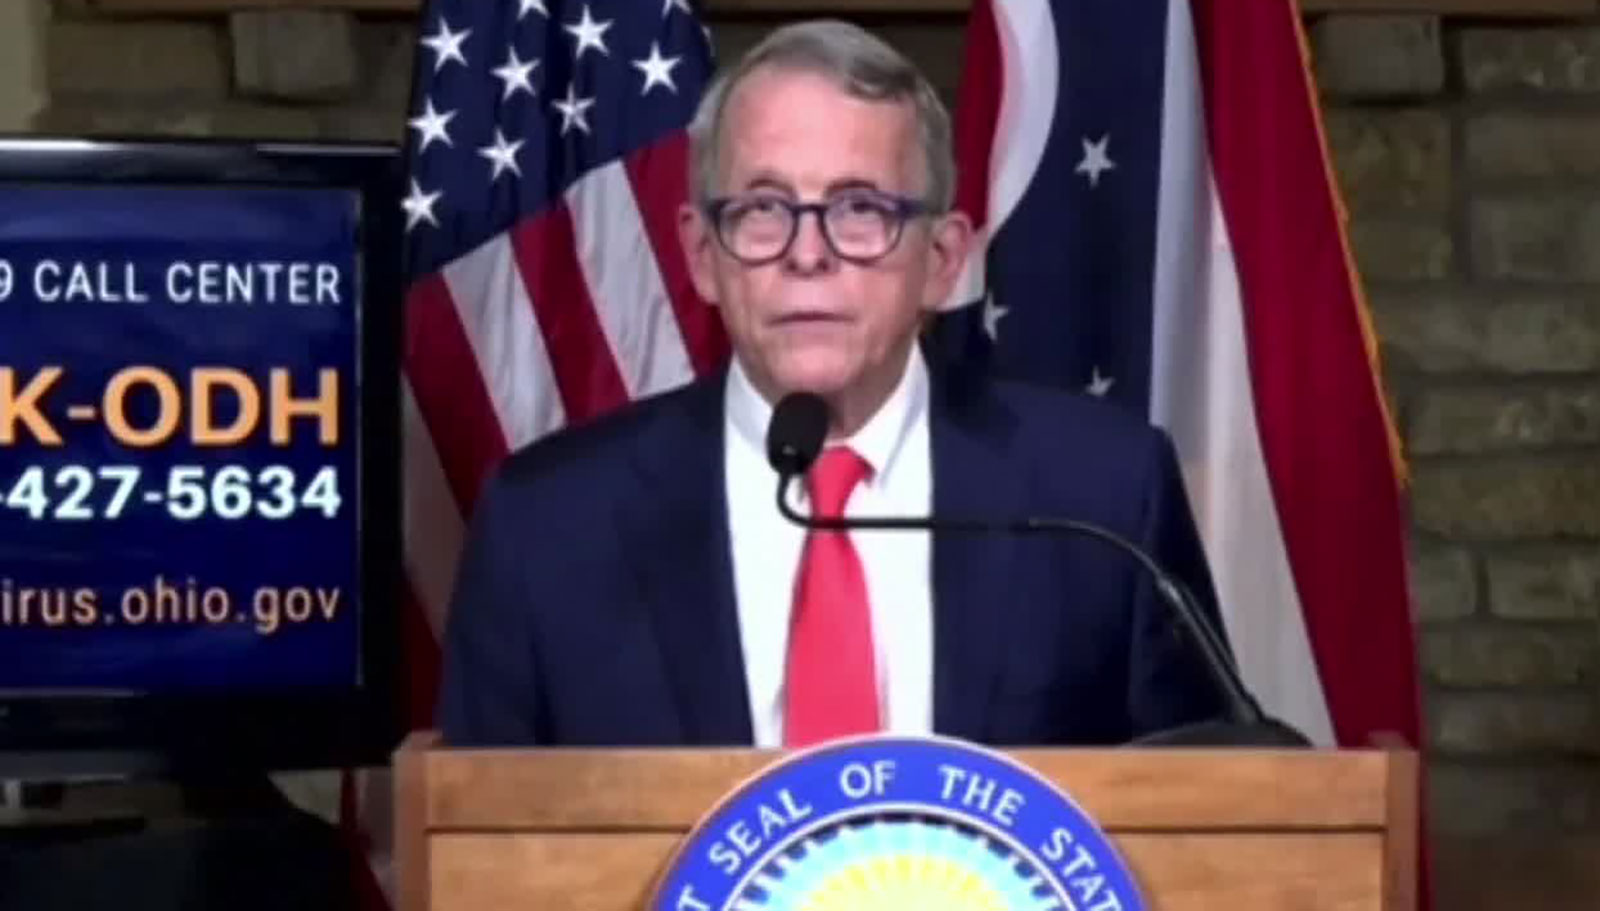 Gov. Mike DeWine speaks during a news conference on Thursday, September 10.